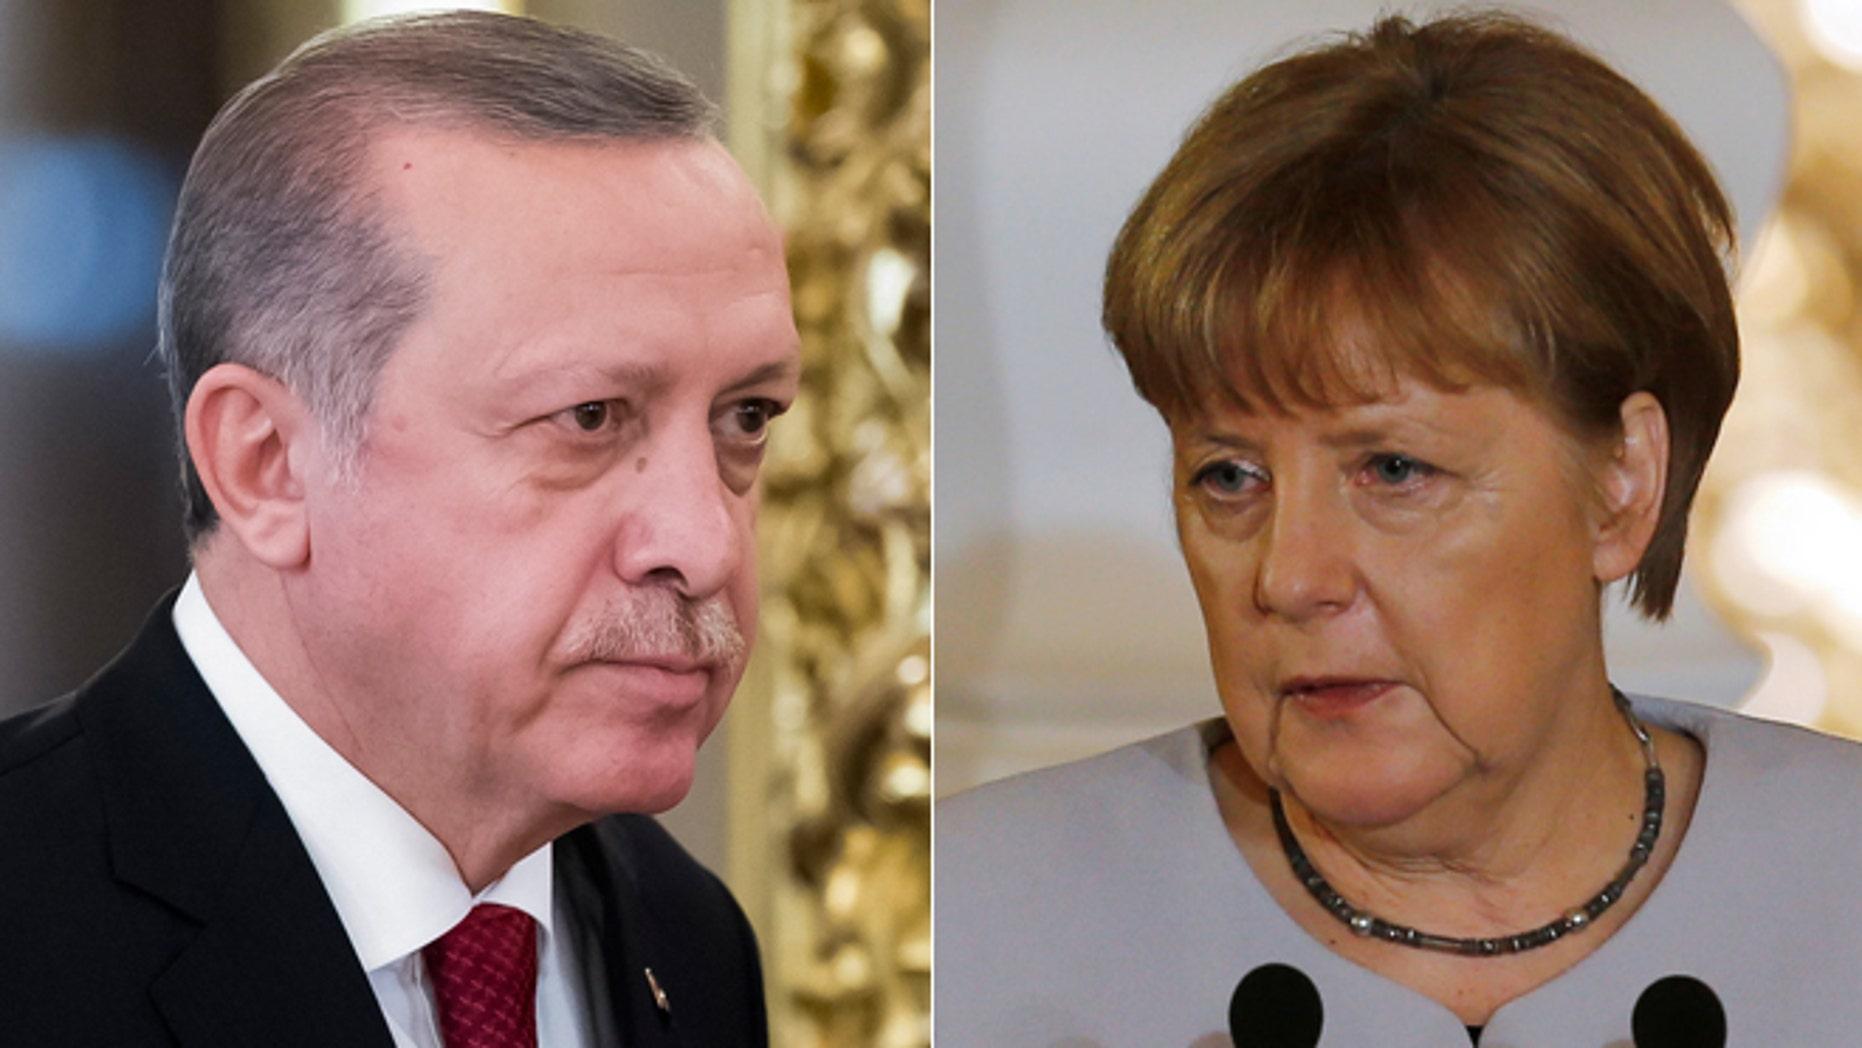 Turkish President Recep Tayyip Erdogan's comments drew a rebuke from German Chancellor Angela Merkel.